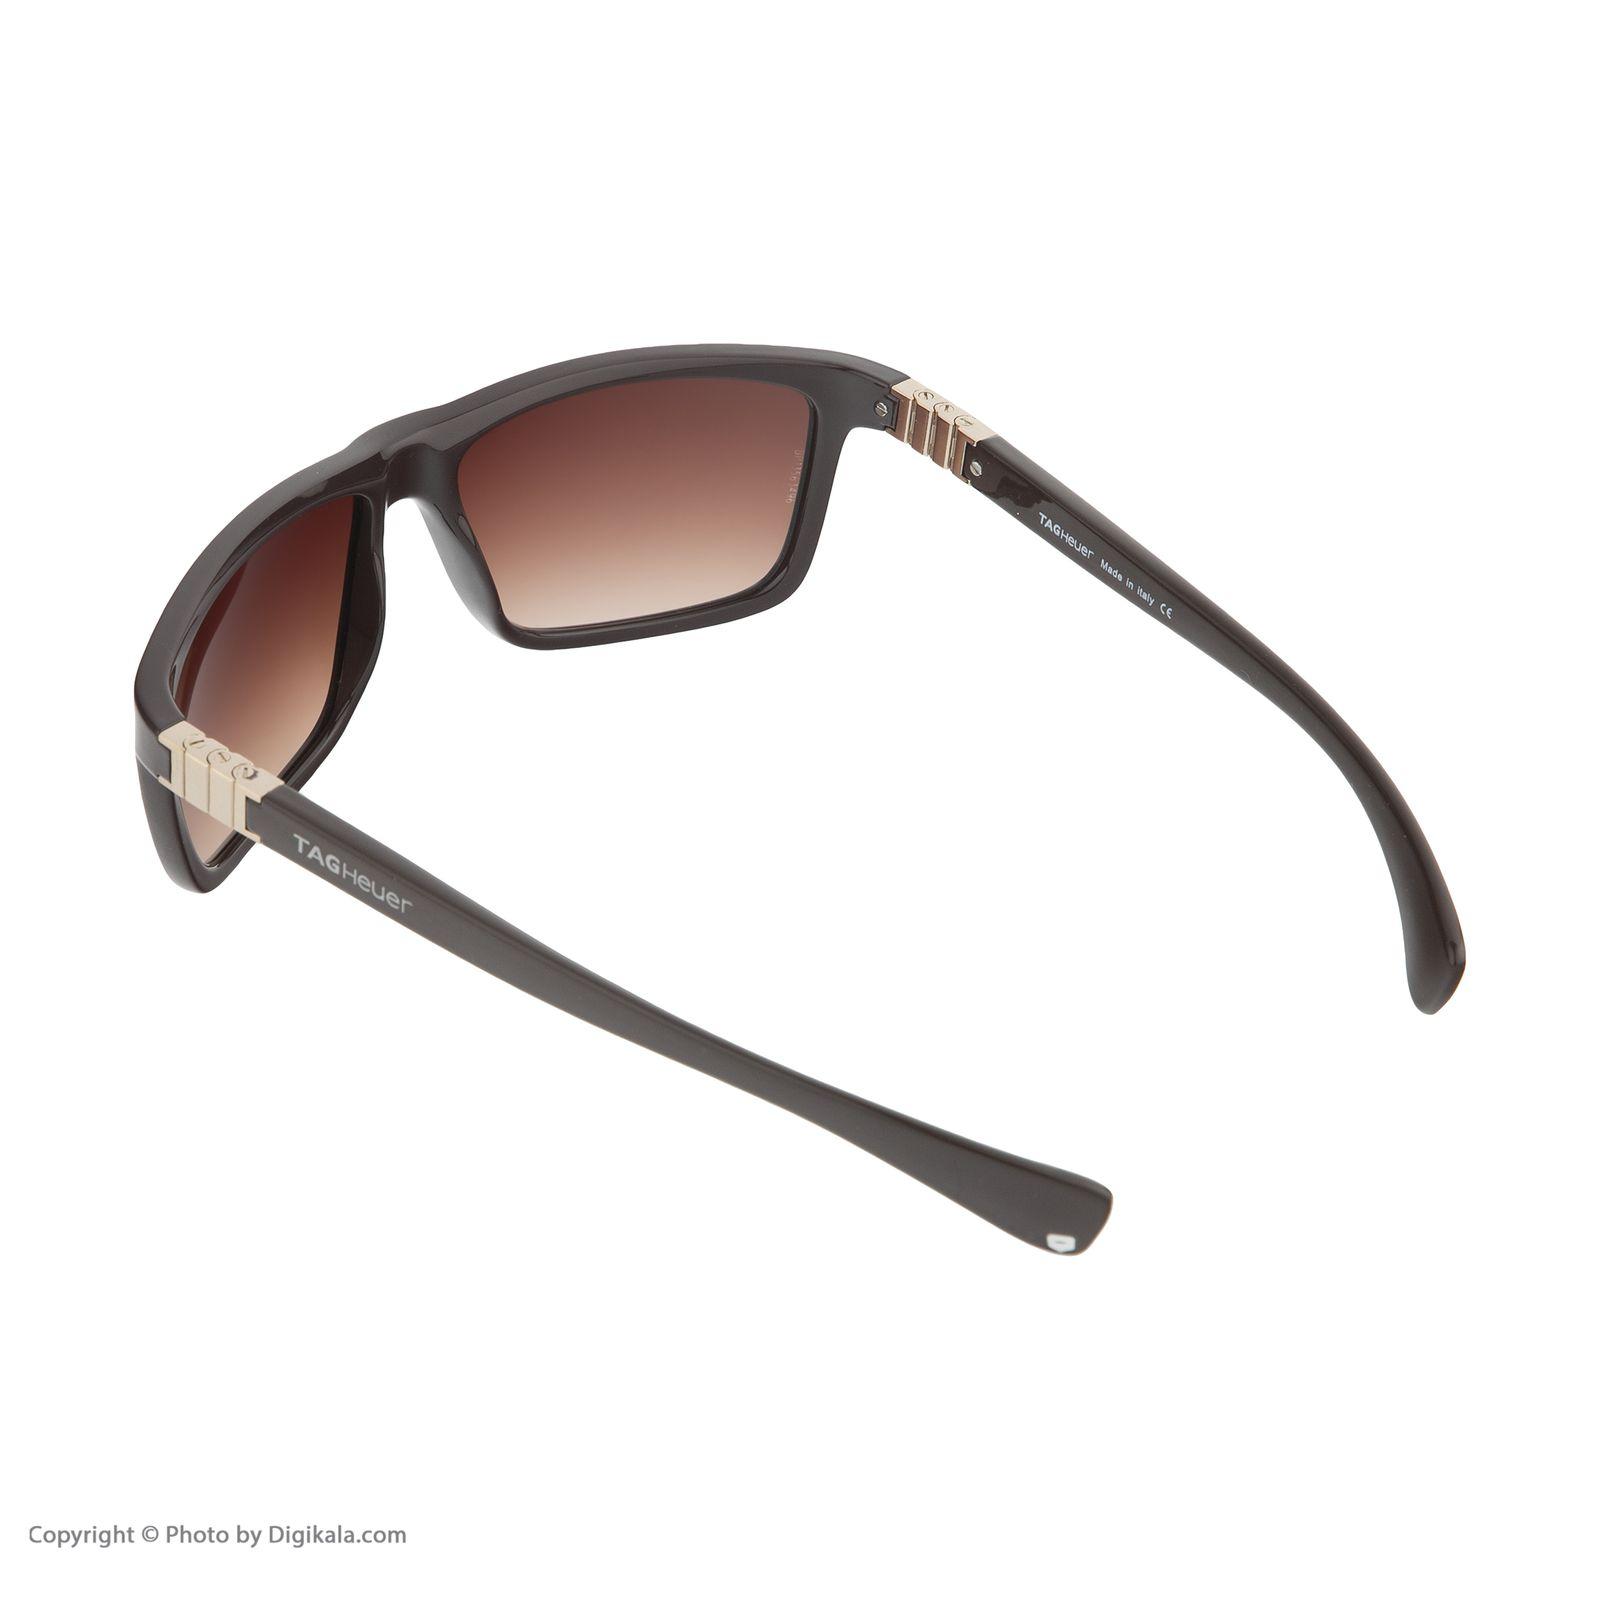 عینک آفتابی تگ هویر مدل 9303 -  - 5